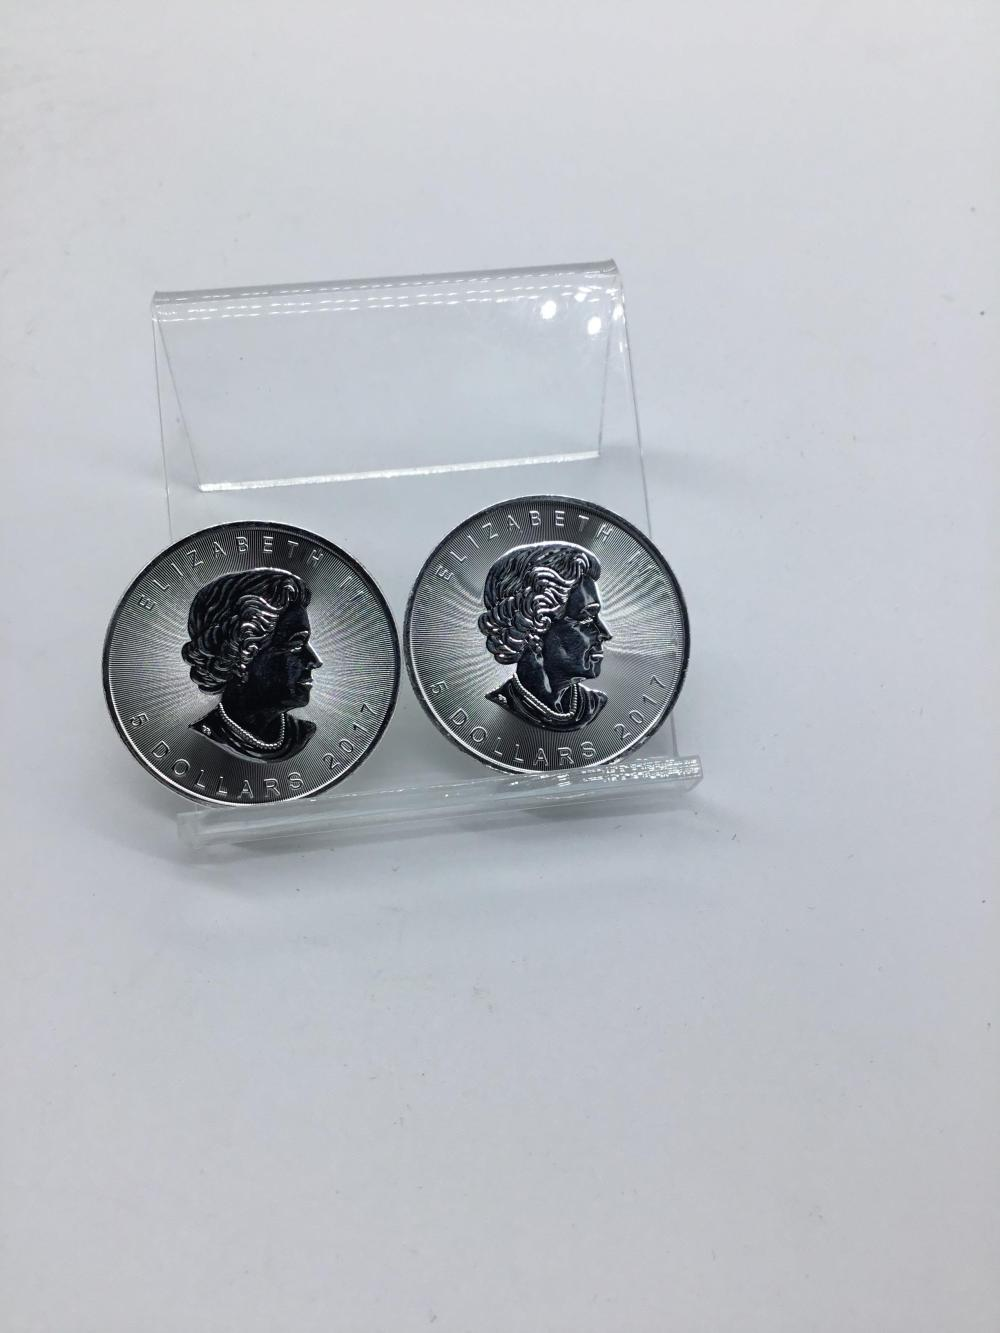 Canada maple leaf silver $5 coin